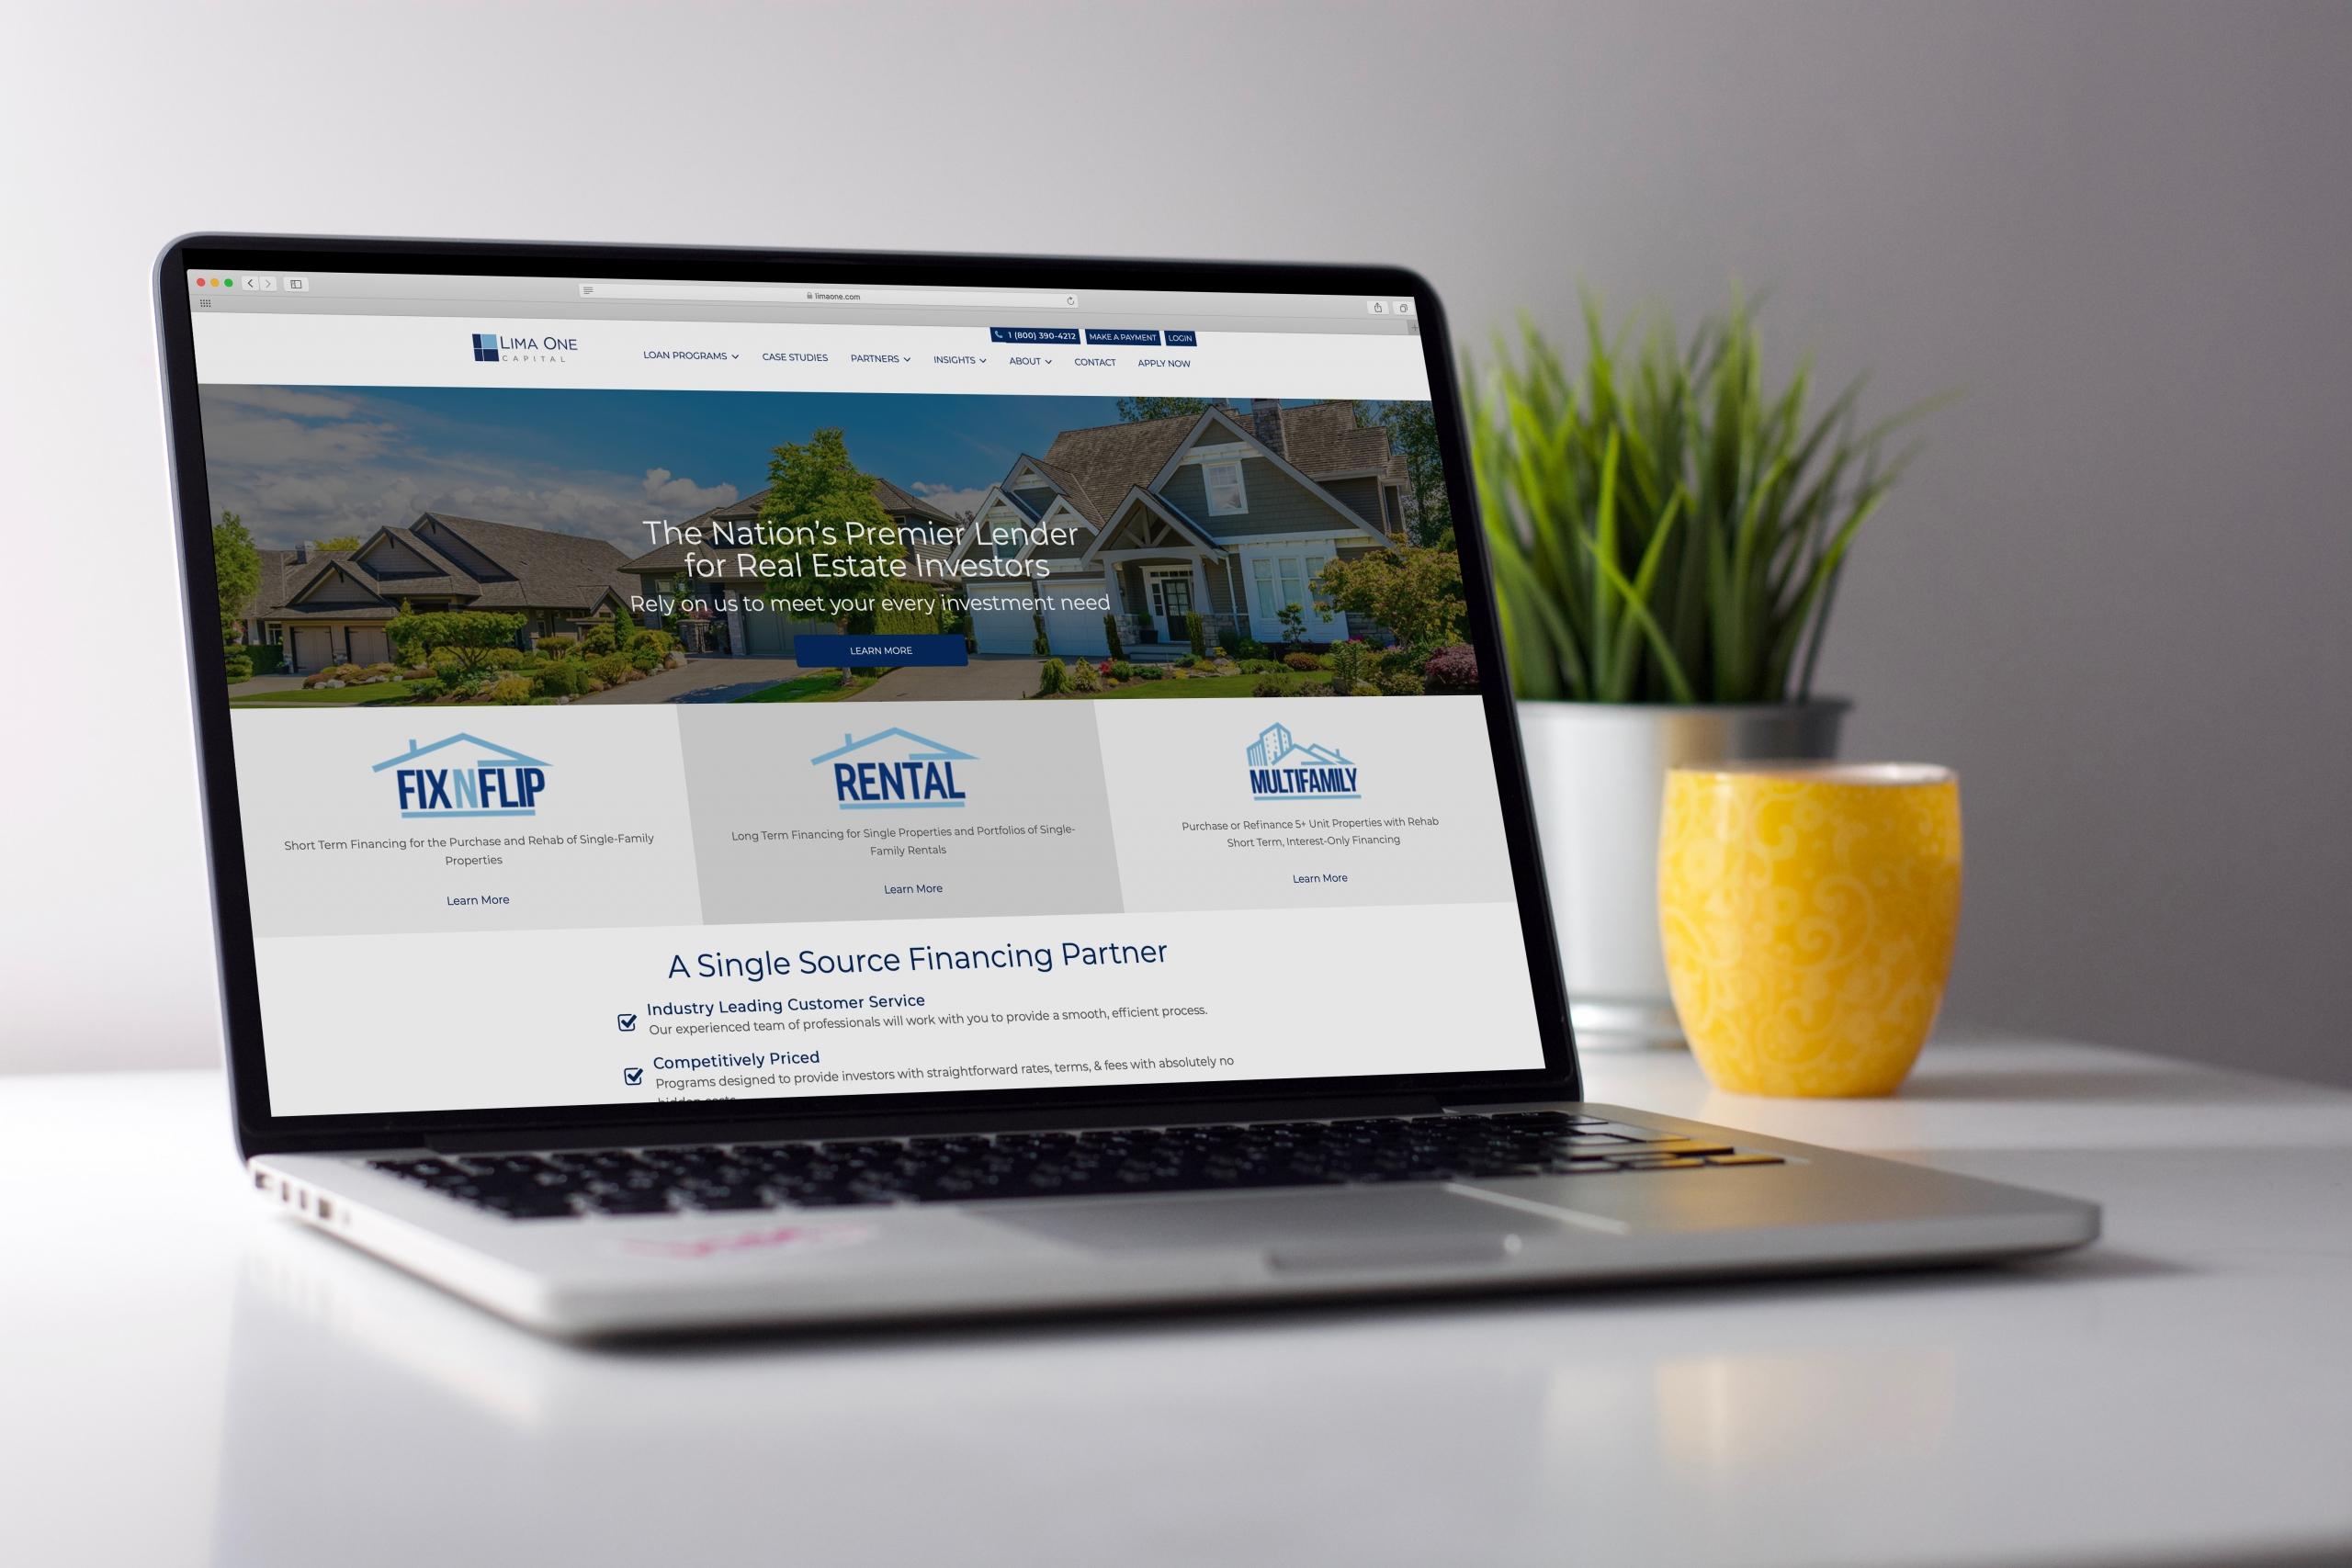 lima one capital website on laptop